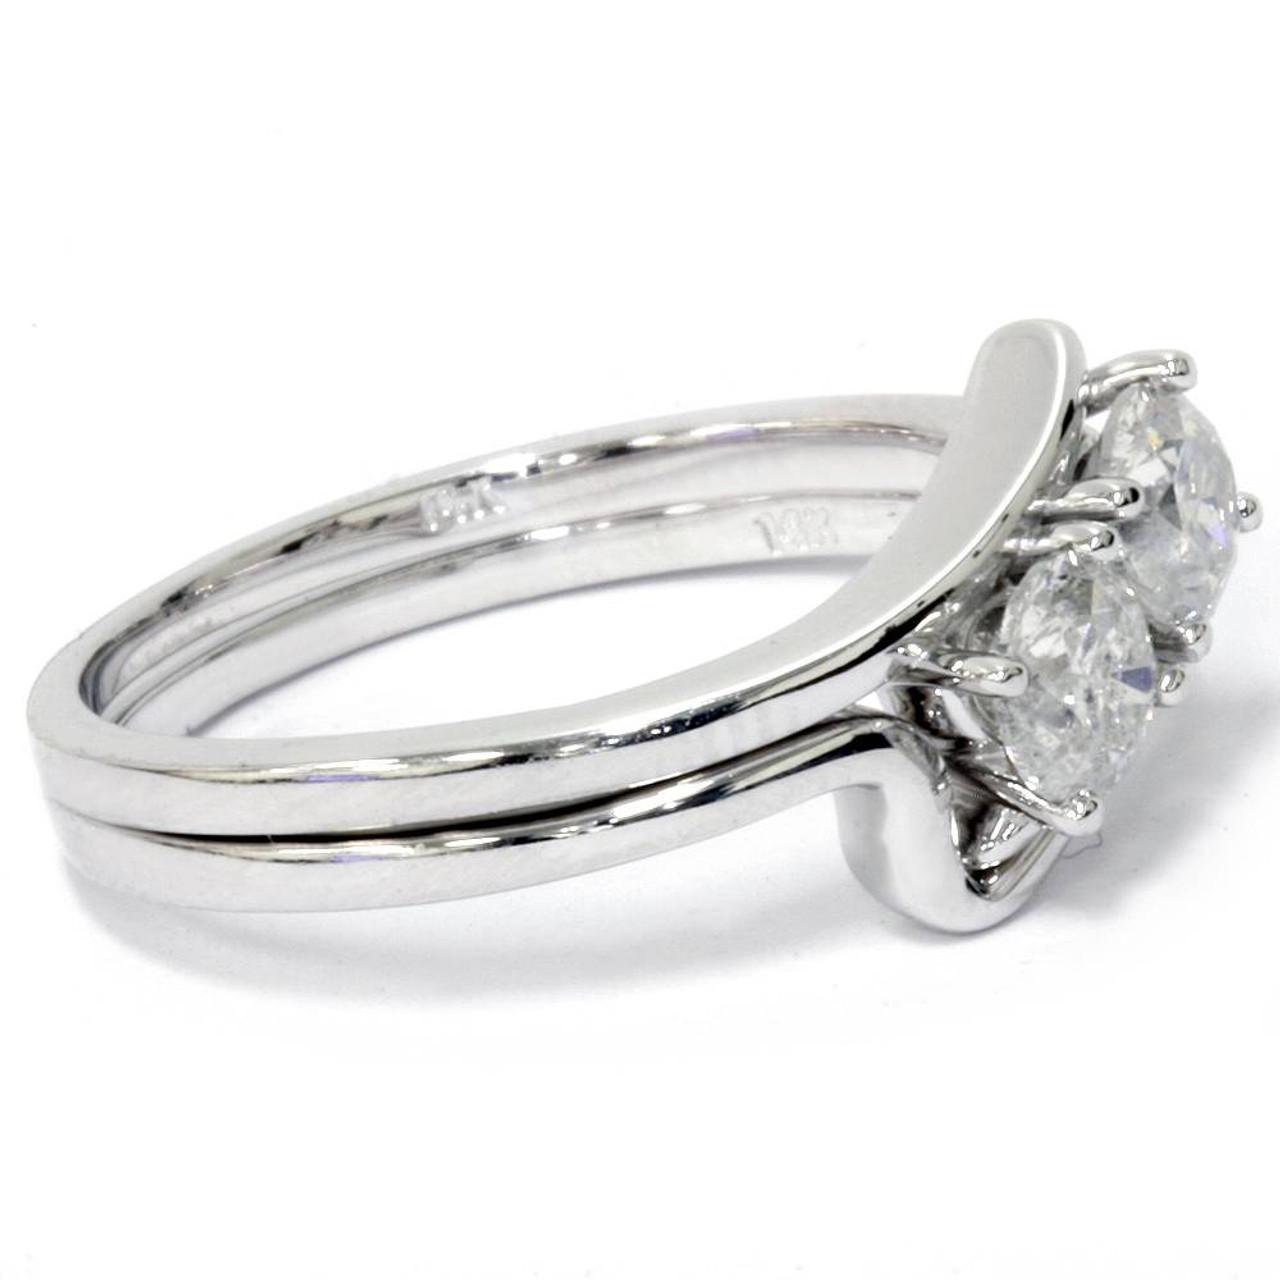 34ct two stone diamond forever us engagement ring set 10k white gold - 10k Wedding Ring